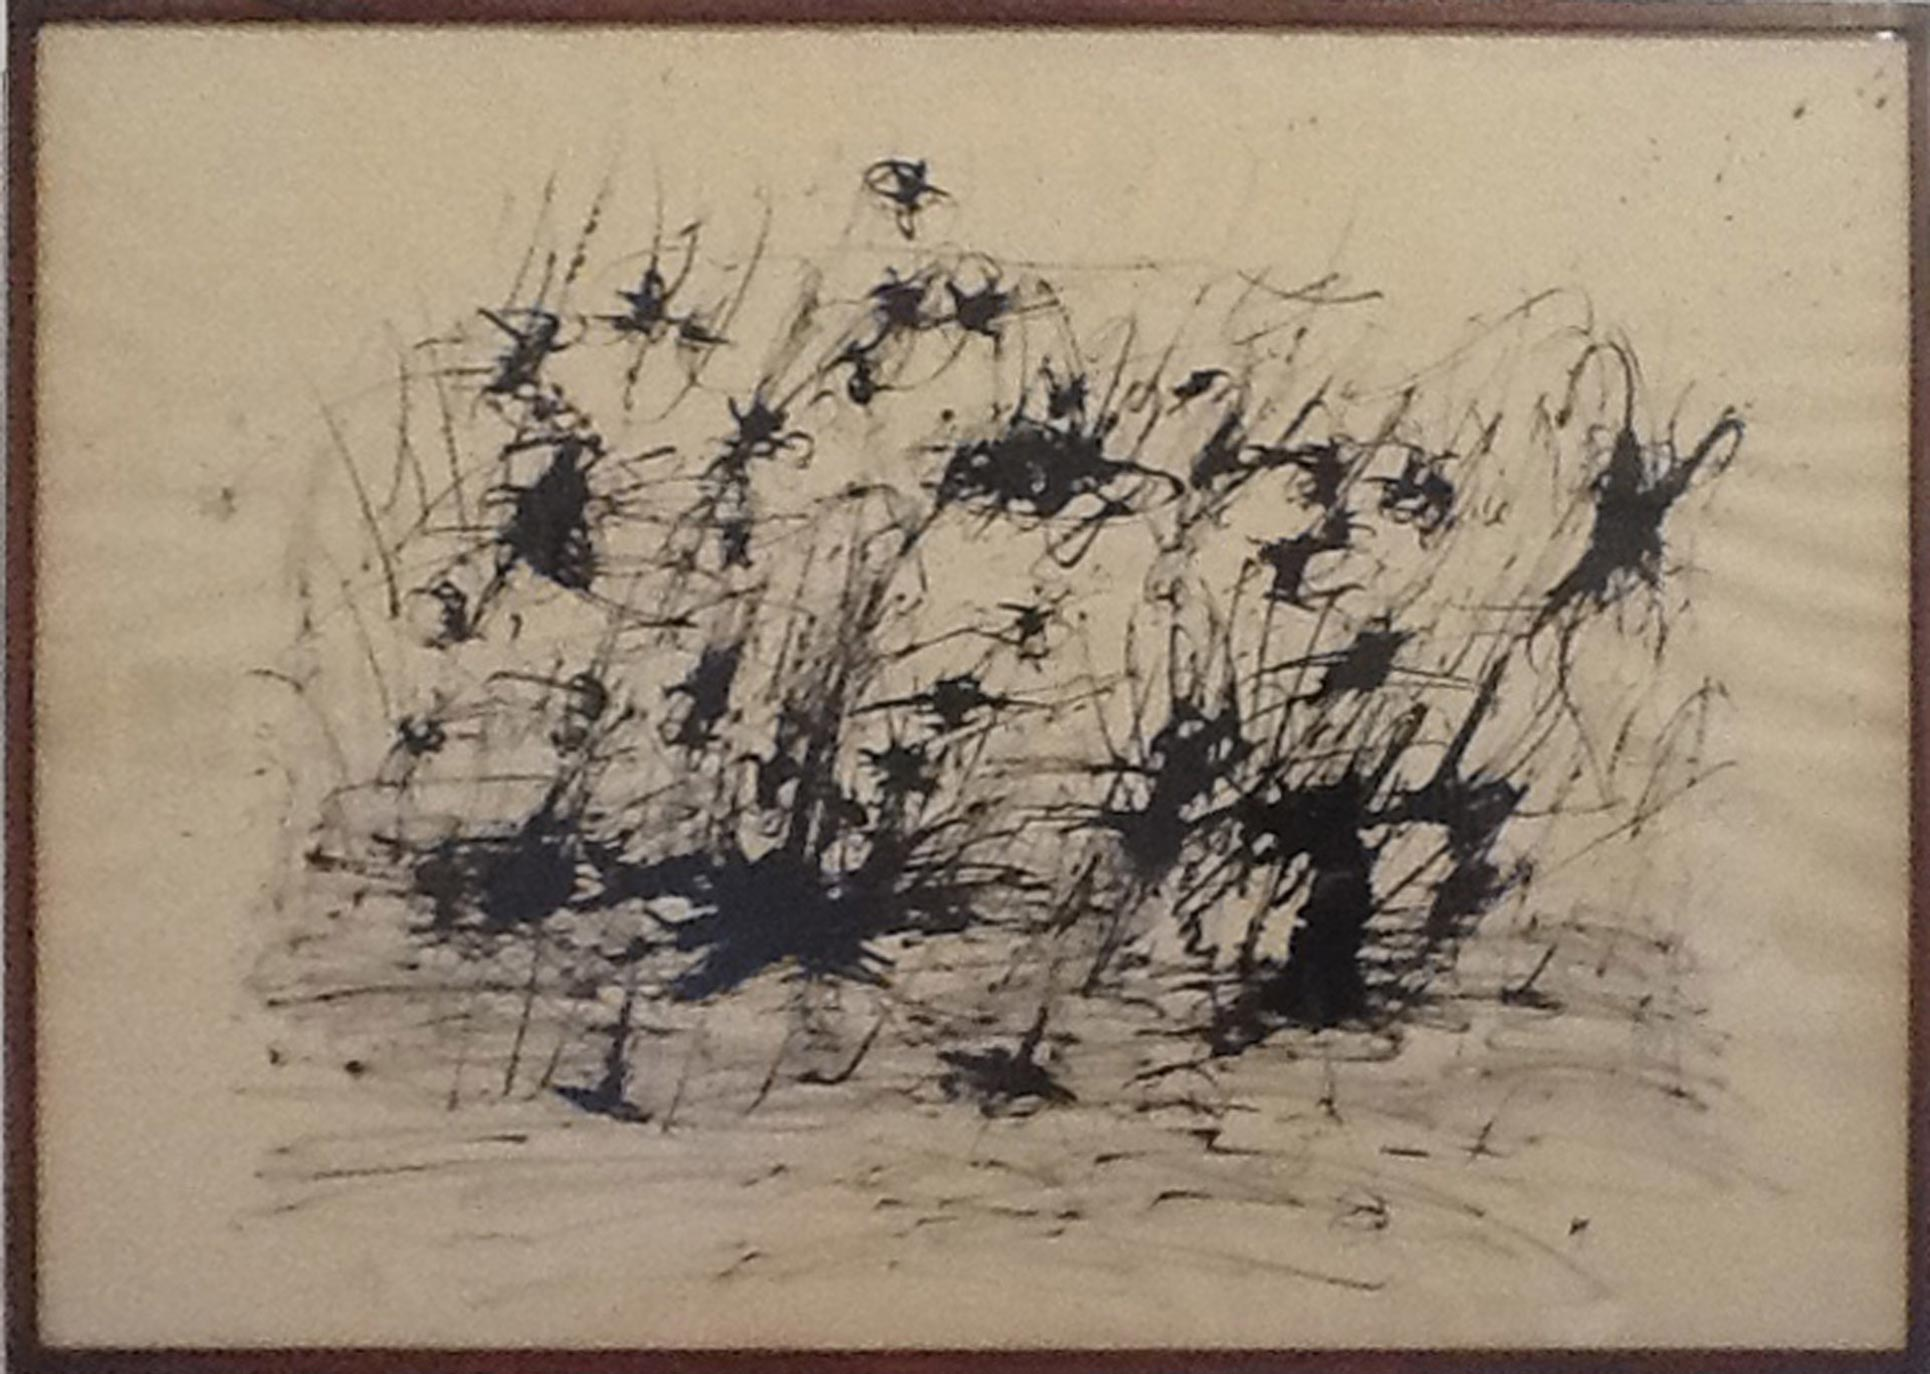 Henri Michaux, Untitled VII, 1960